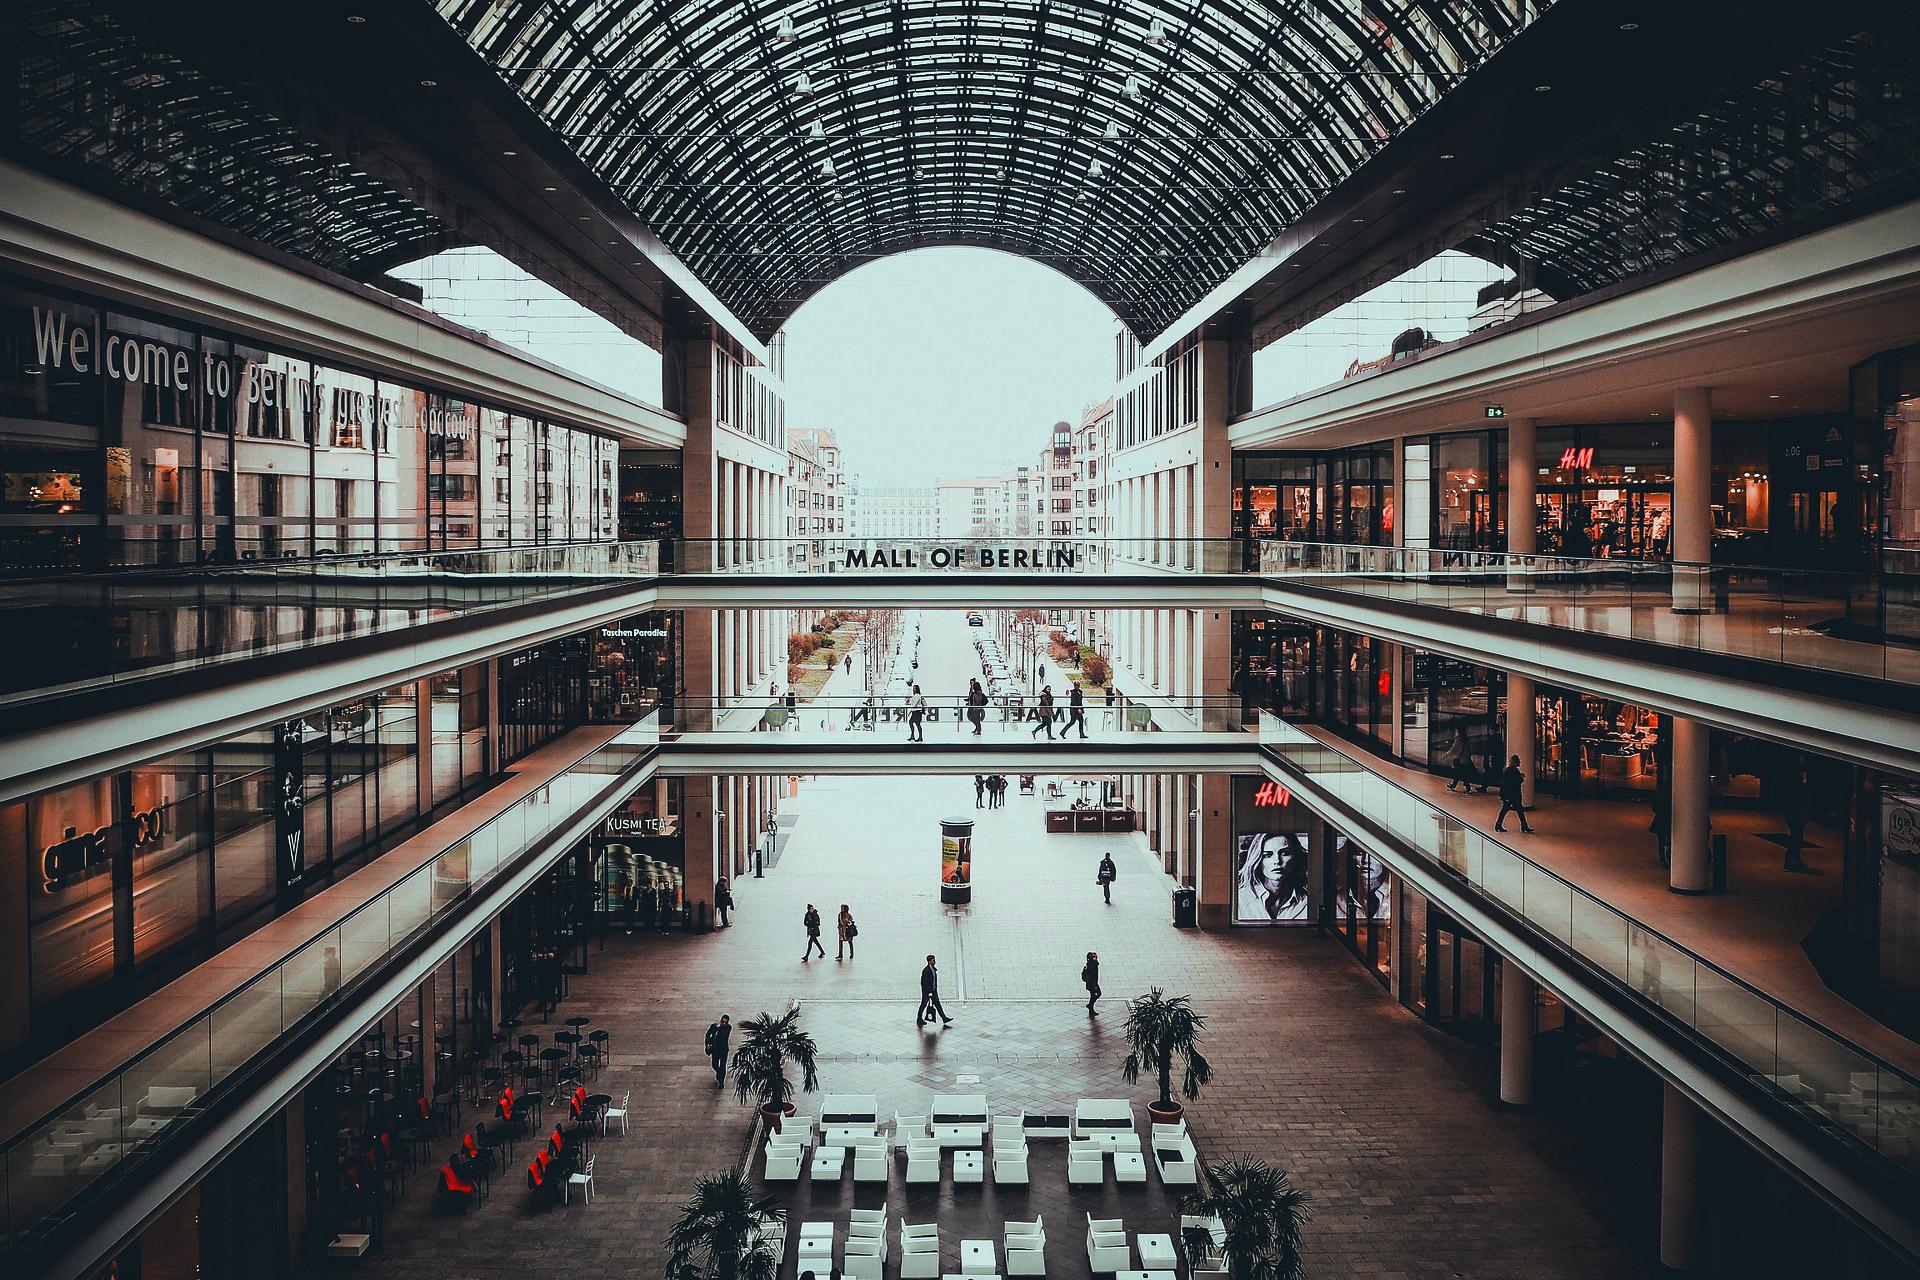 etaLight Anwendung Schaufenster in der Mall of Berlin